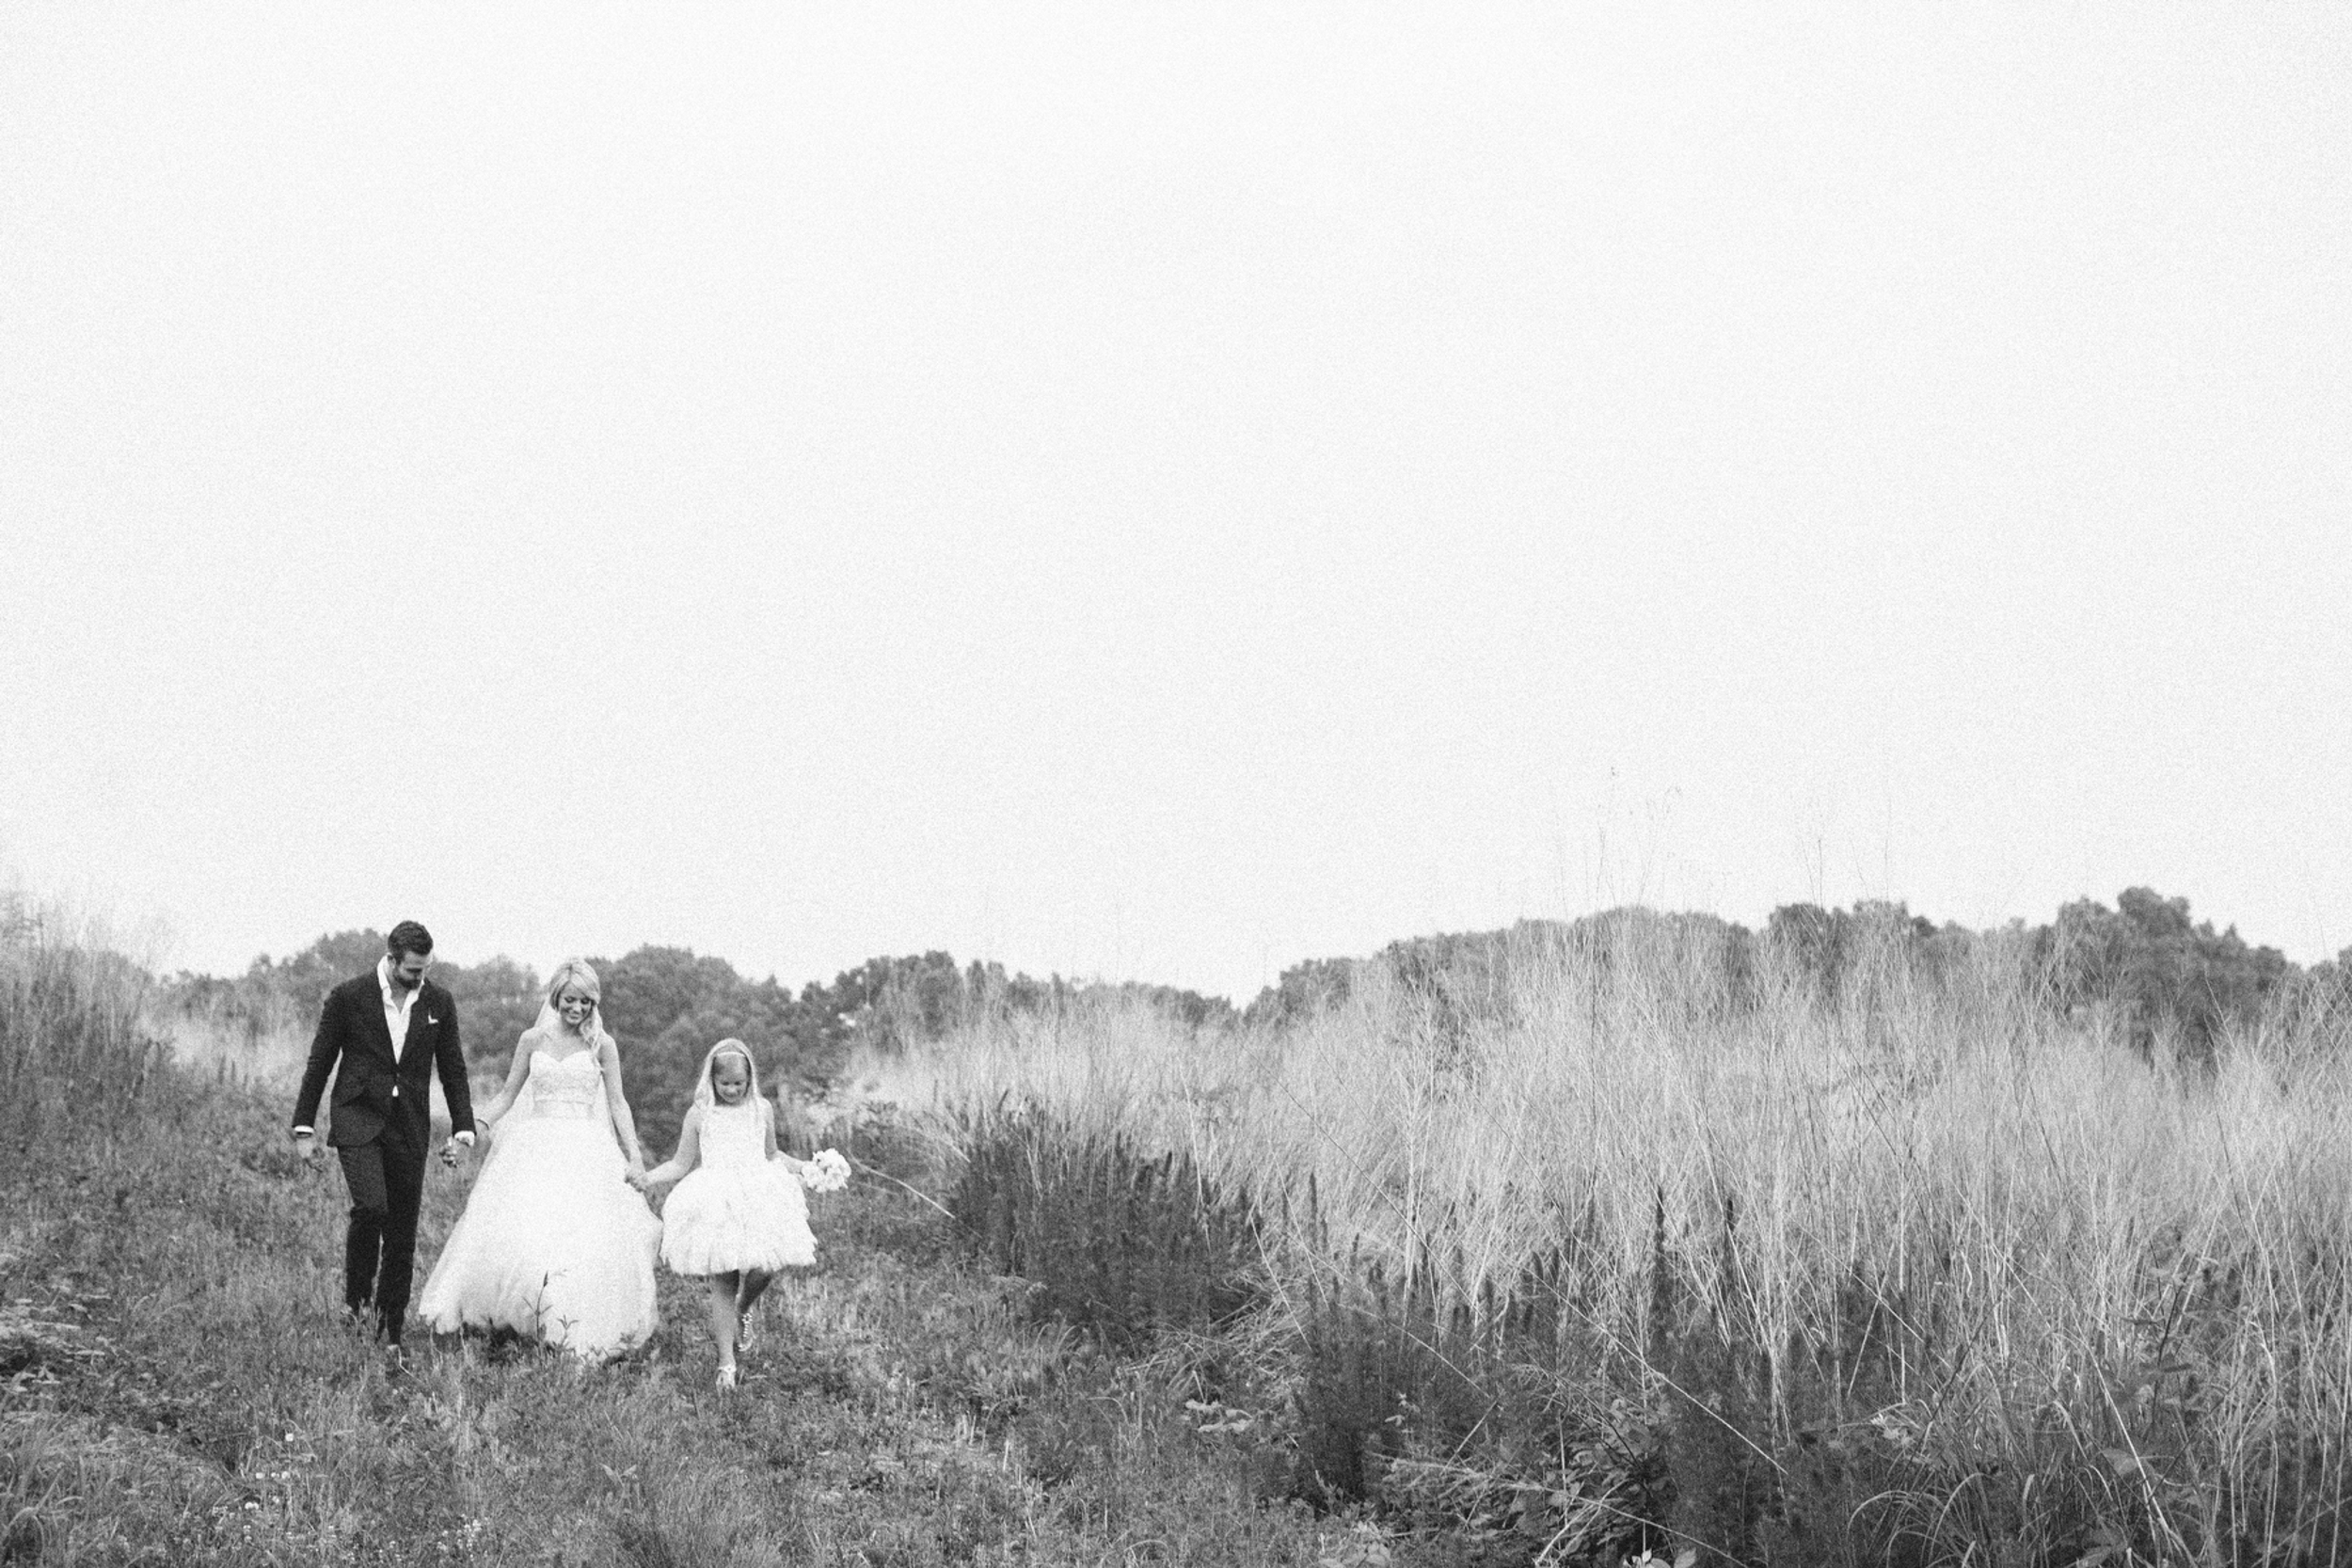 south_carolina_farm_wedding_rustic_chic_surprise_secret_luxe_wedding_bachelorette_emily_maynard_real_weddings-57.jpg